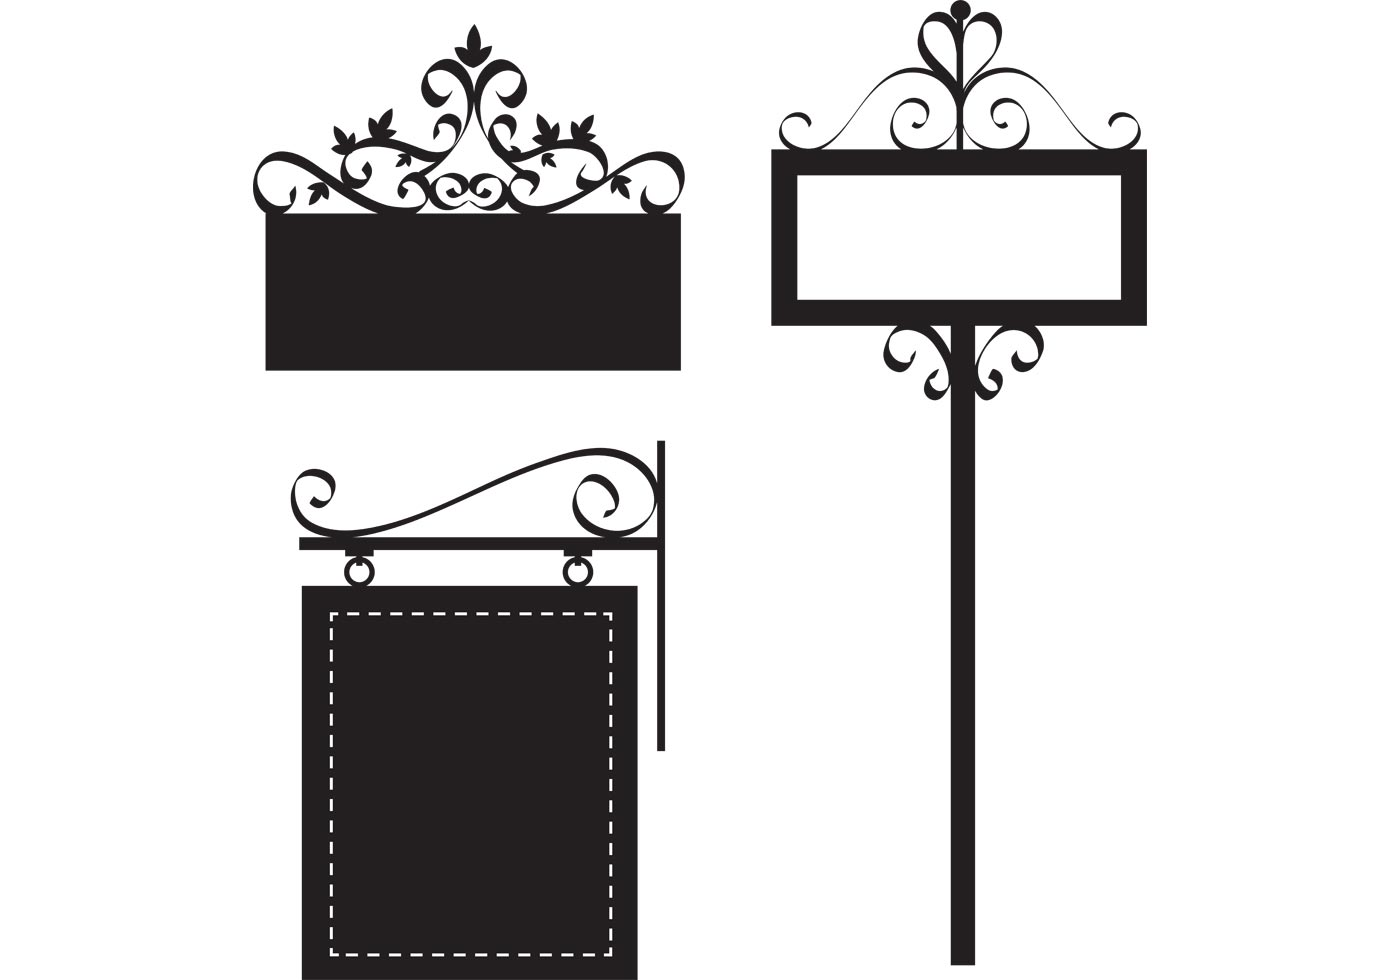 Free Ornate Sign Vectors